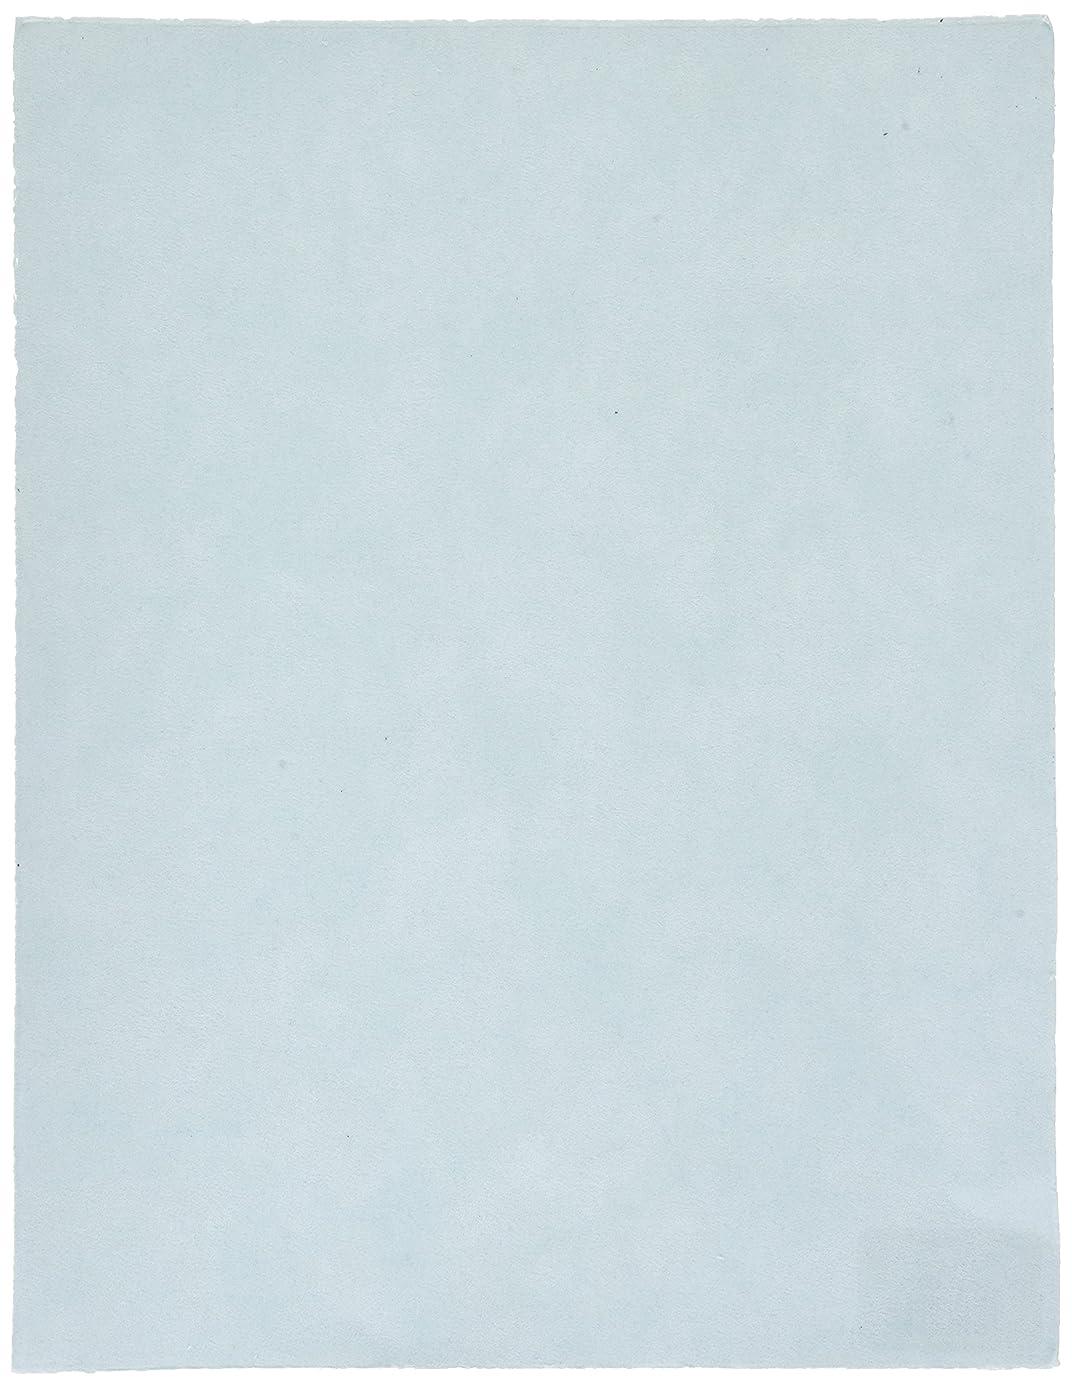 Sew Easy Industries 12-Sheet Velvet Paper, 8.5 by 11-Inch, Cloud